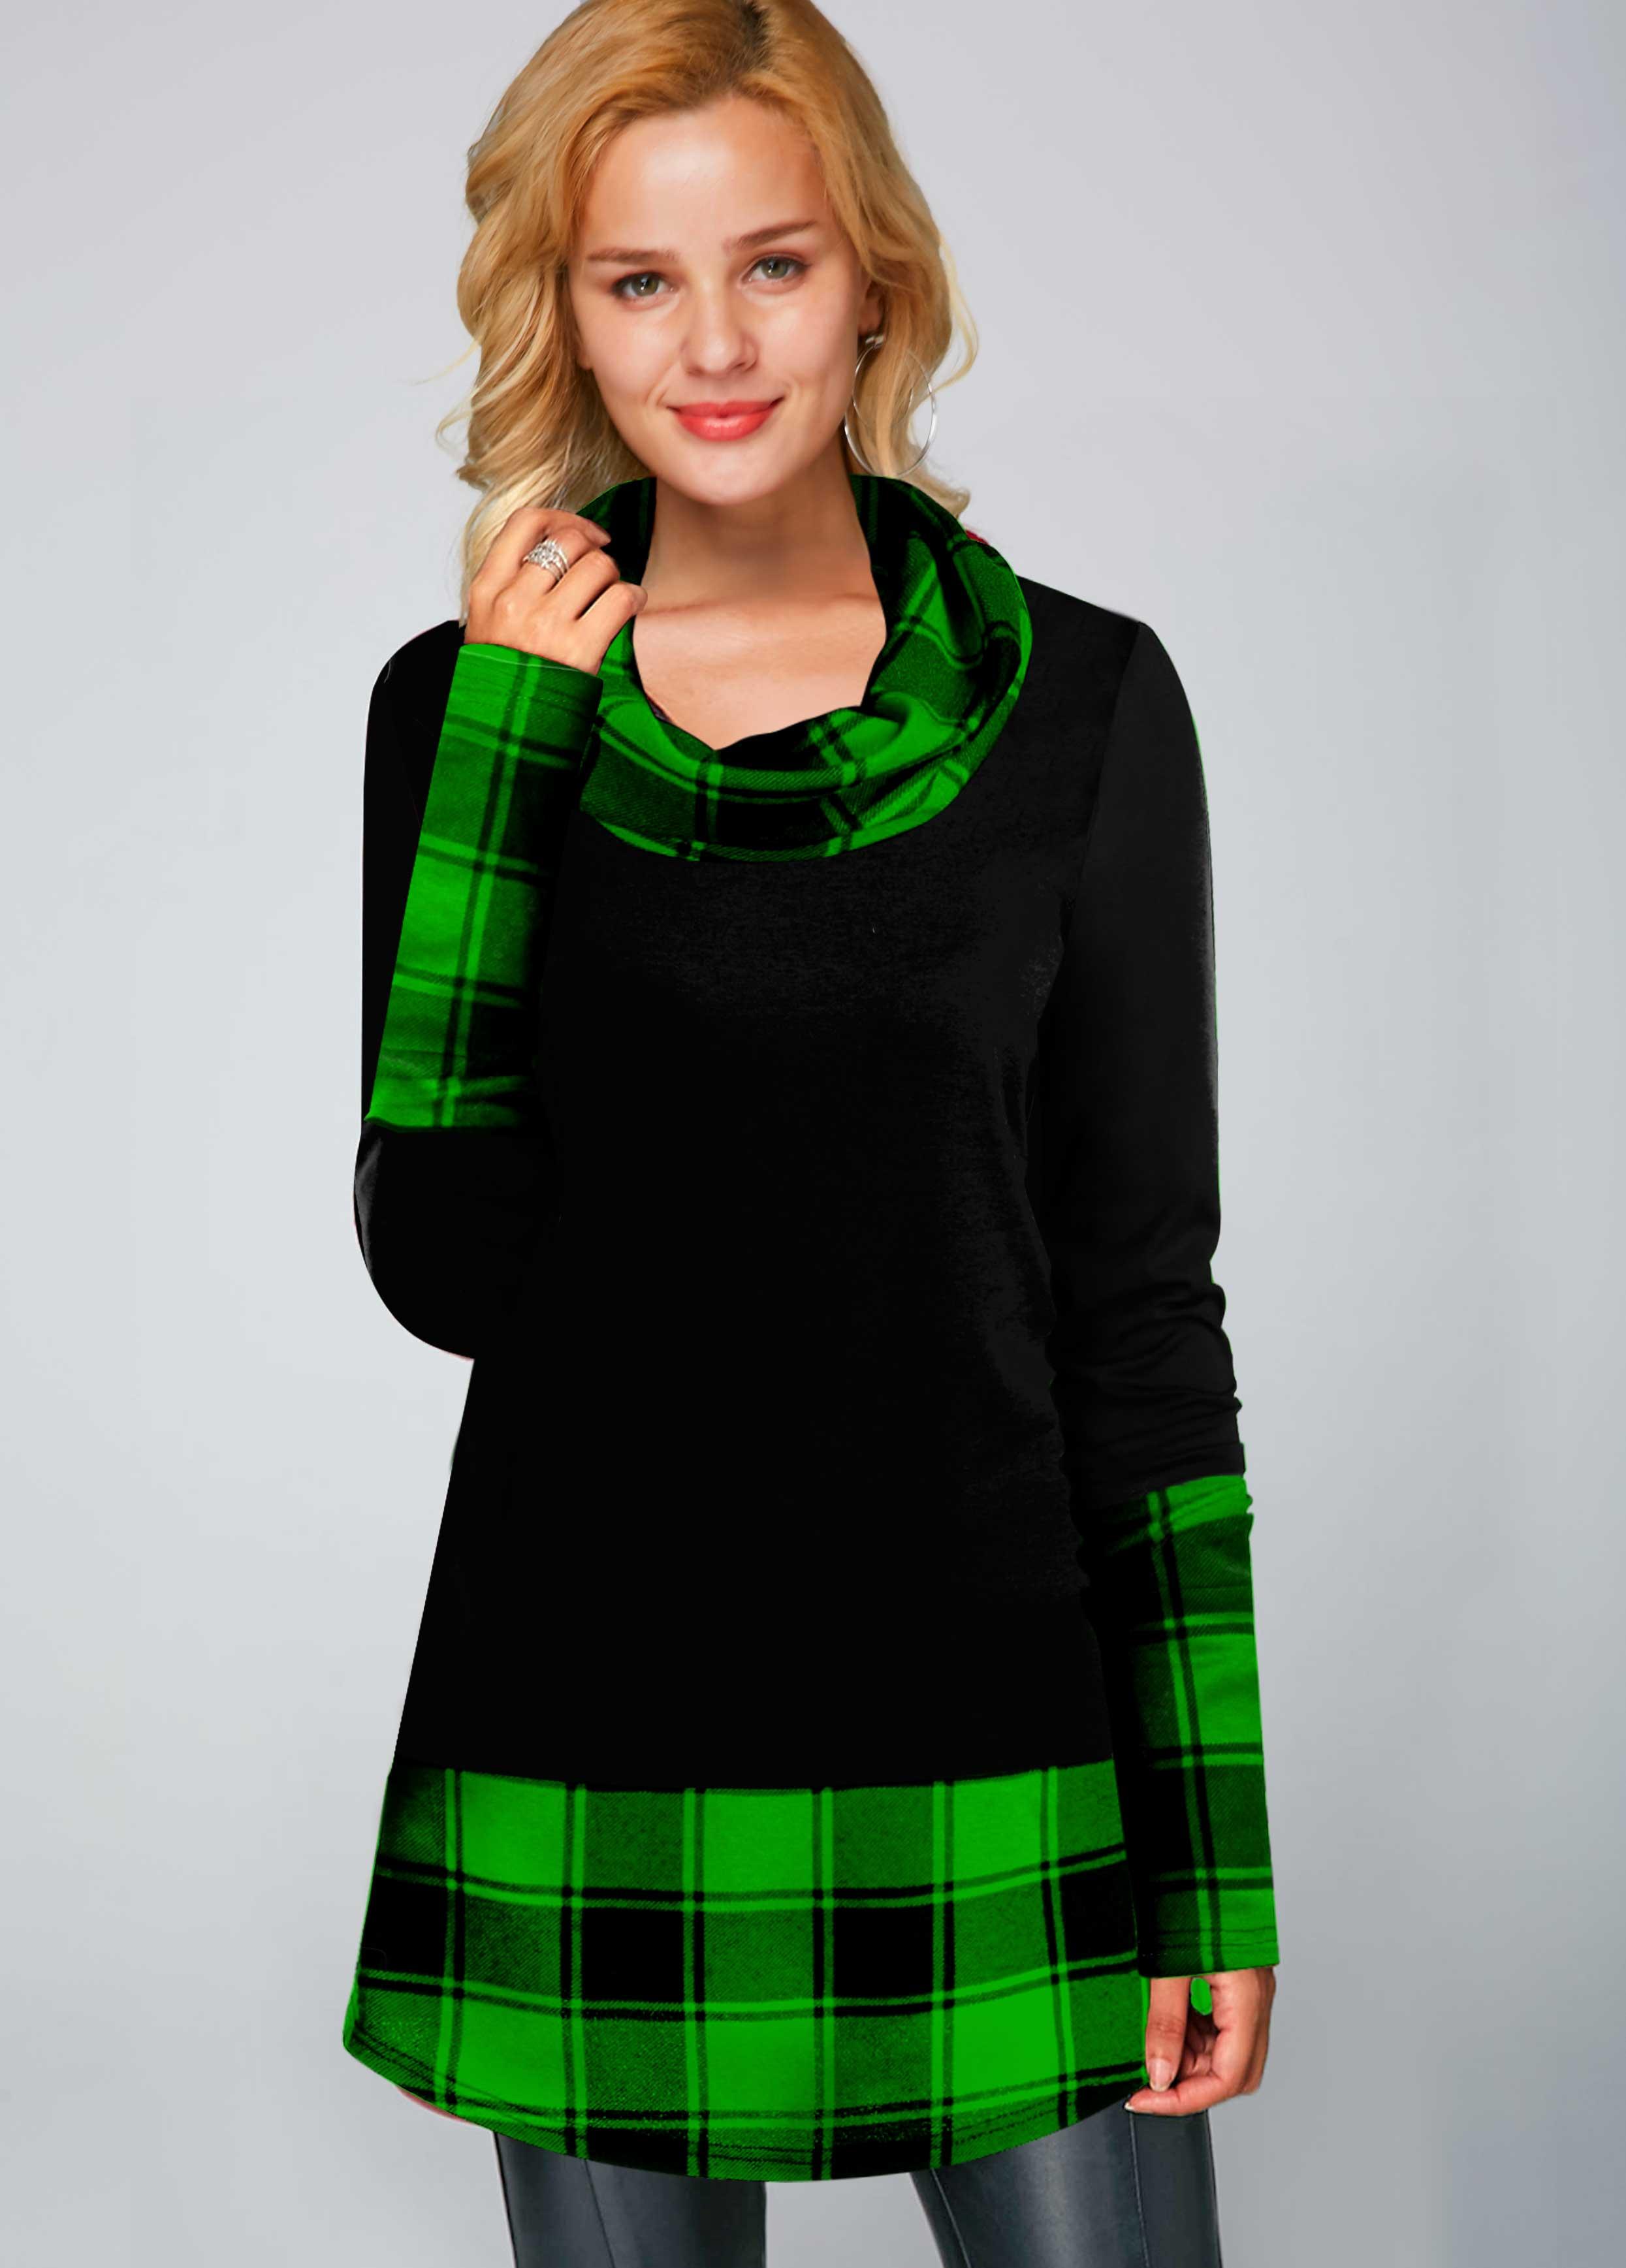 Plaid Print Cowl Neck Long Sleeve Tunic Top